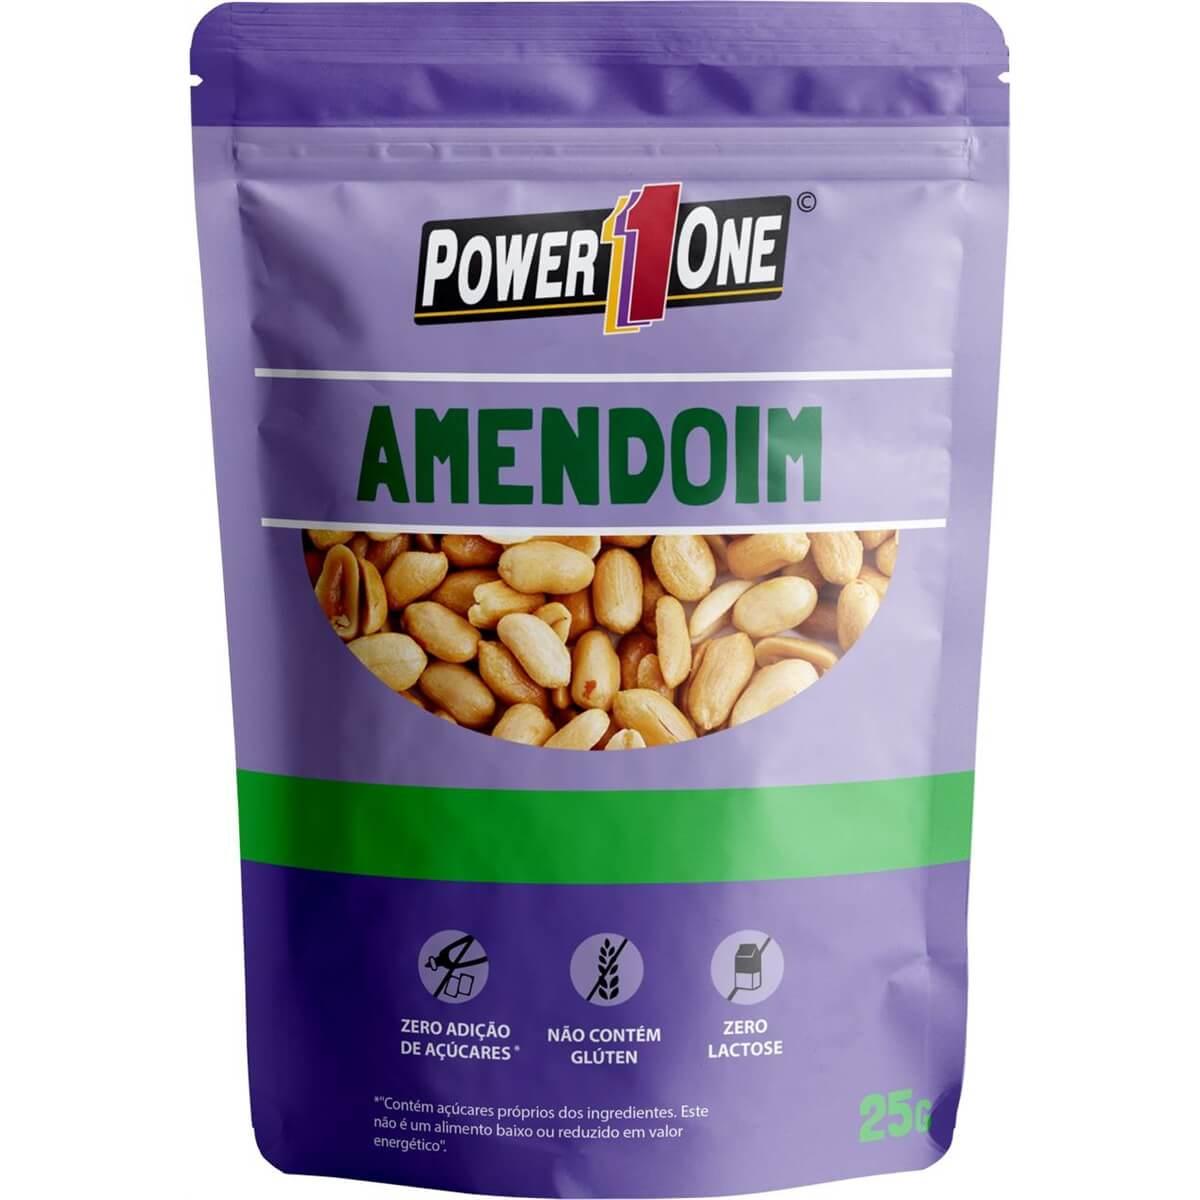 Nuts Amendoim (25g) - Power1One